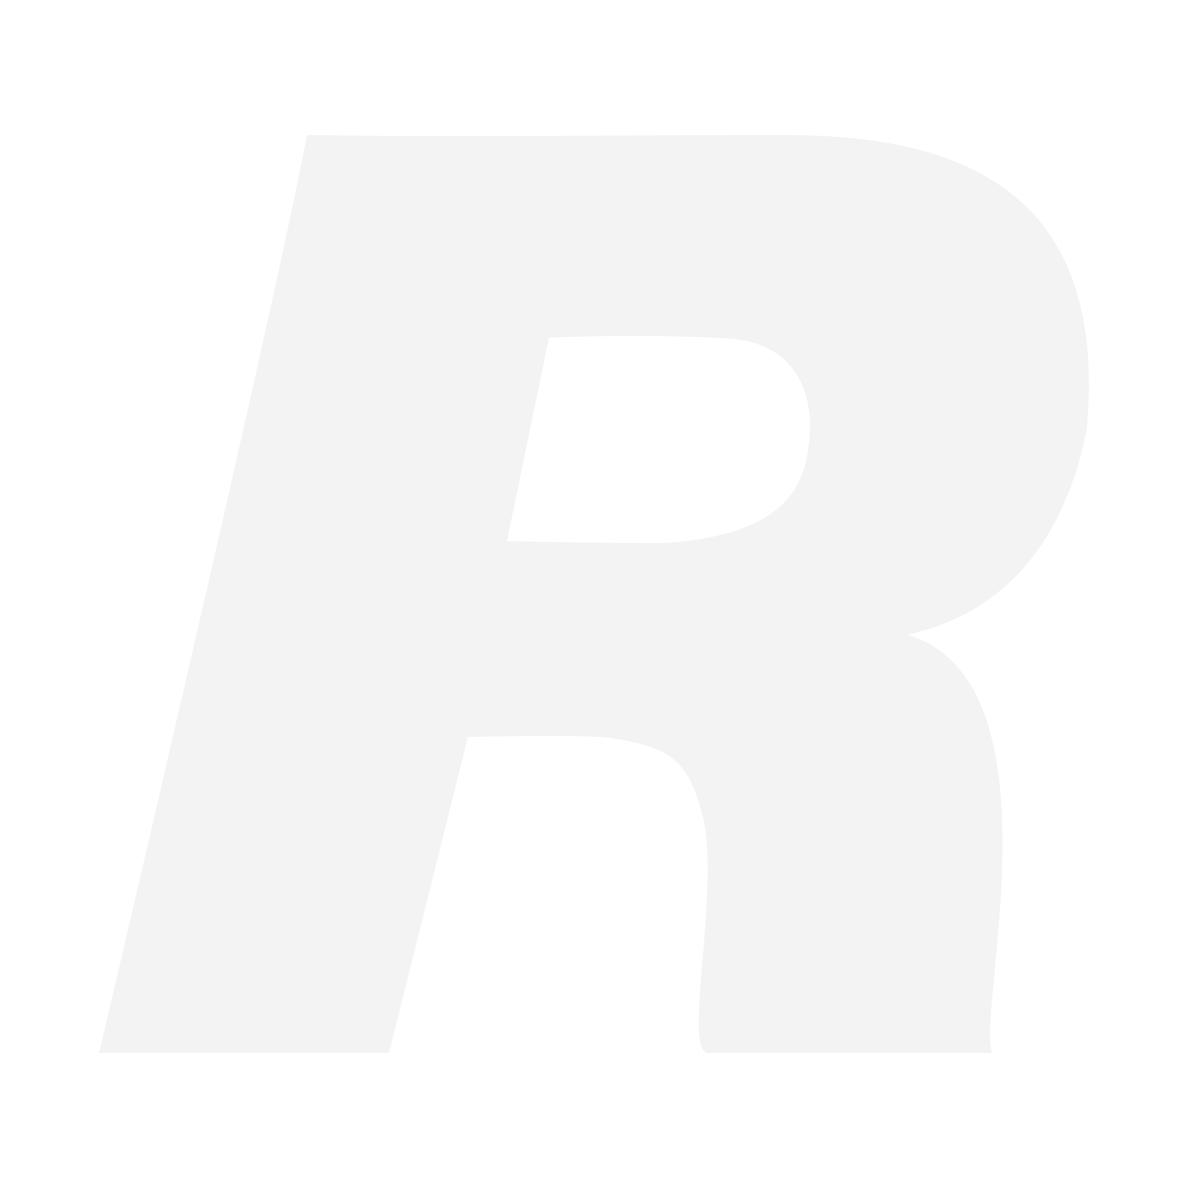 Zeiss Touit 32/1.8, Sony E